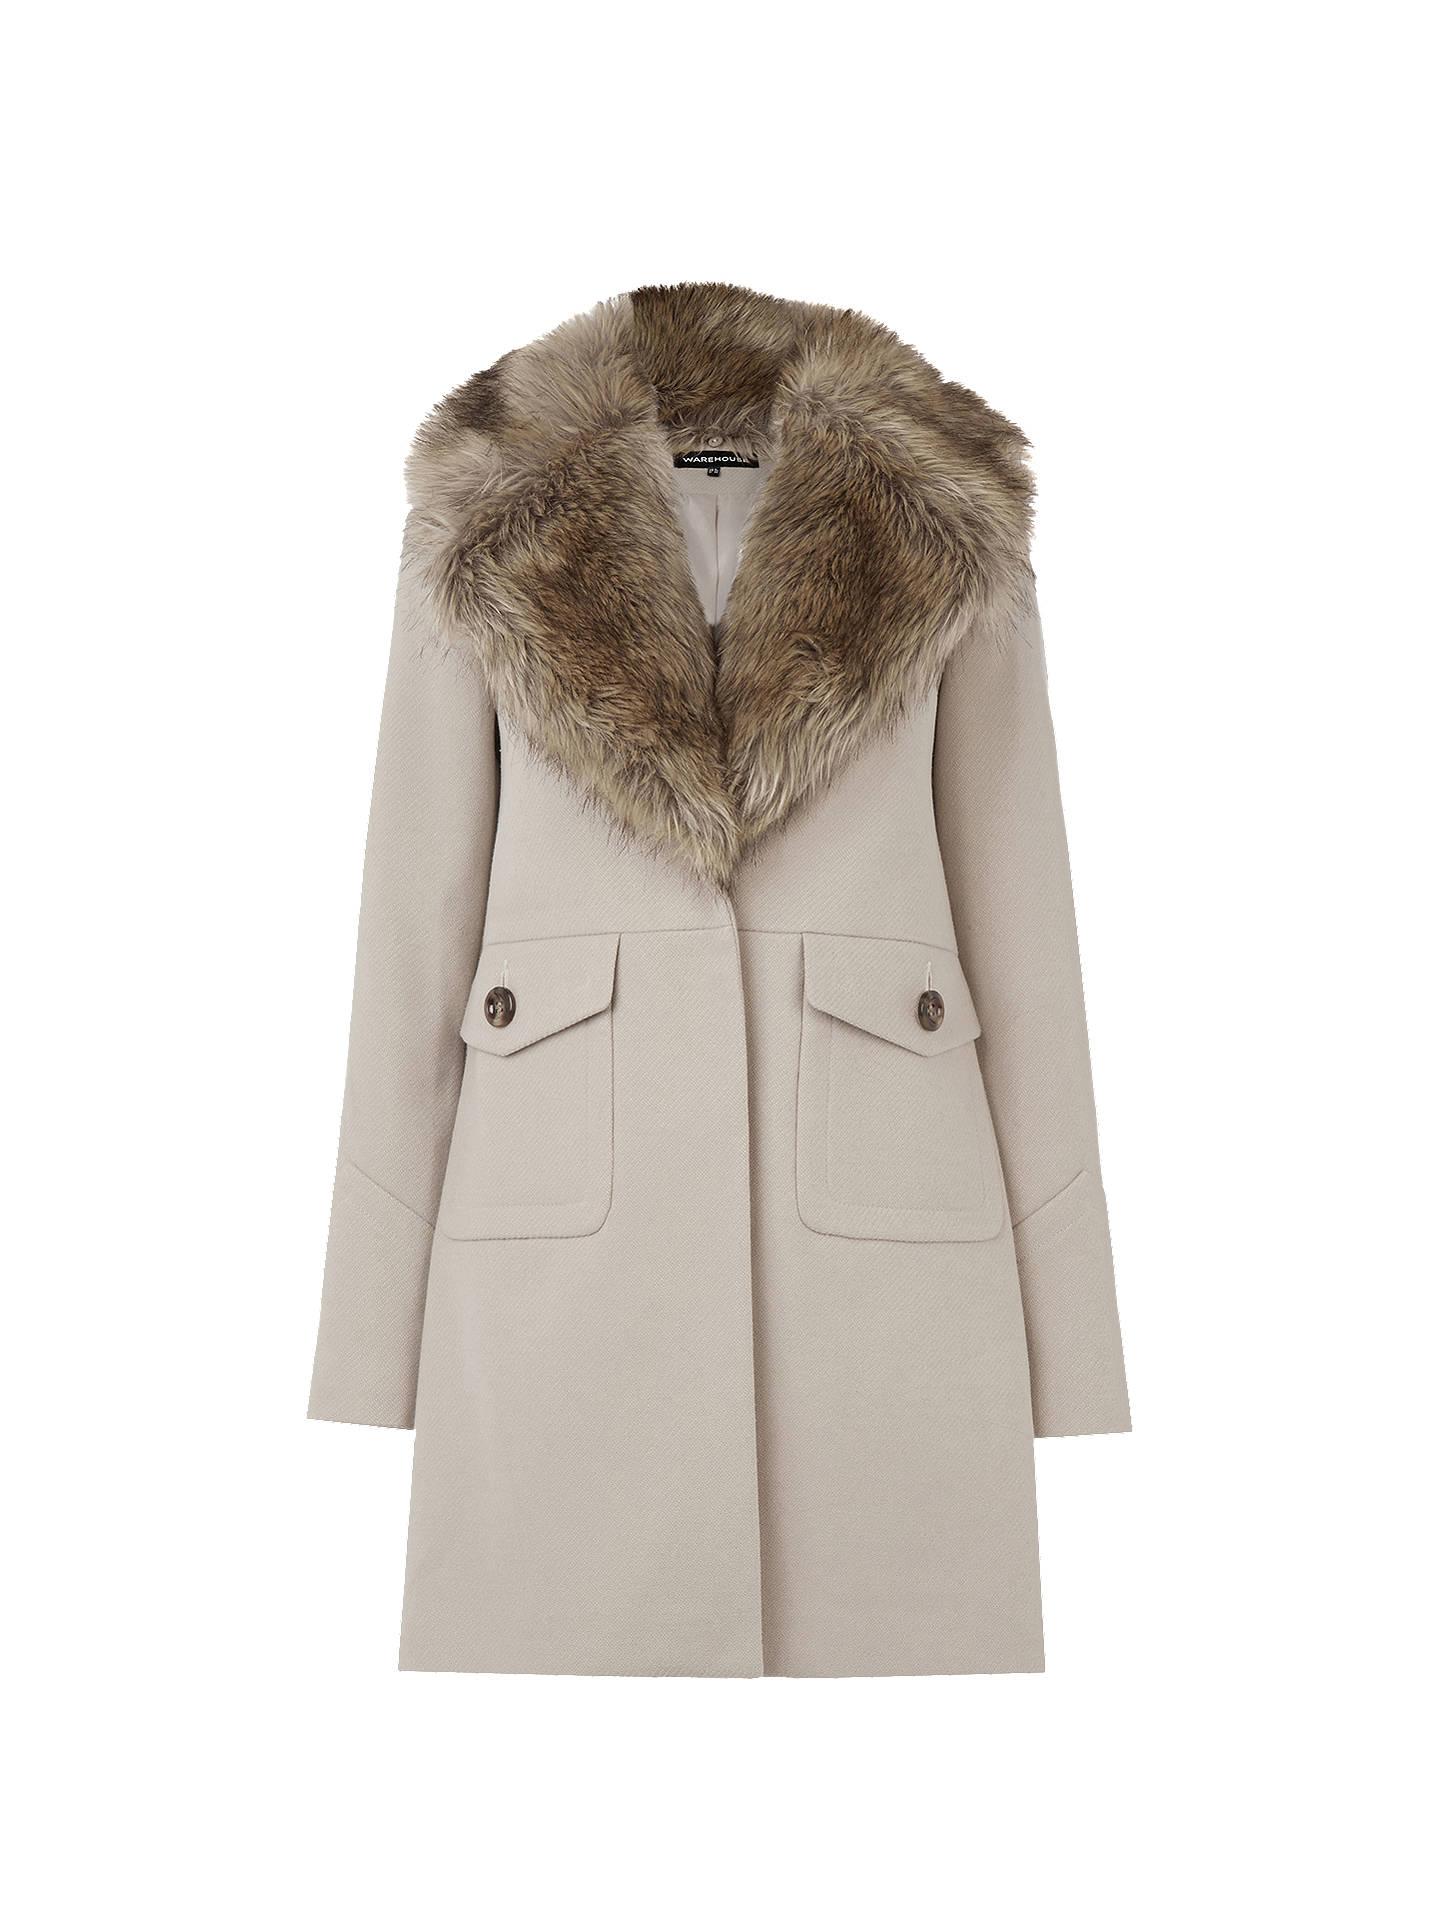 skilful manufacture cheaper original Warehouse Extreme Faux Fur Collar Coat, Camel at John Lewis ...